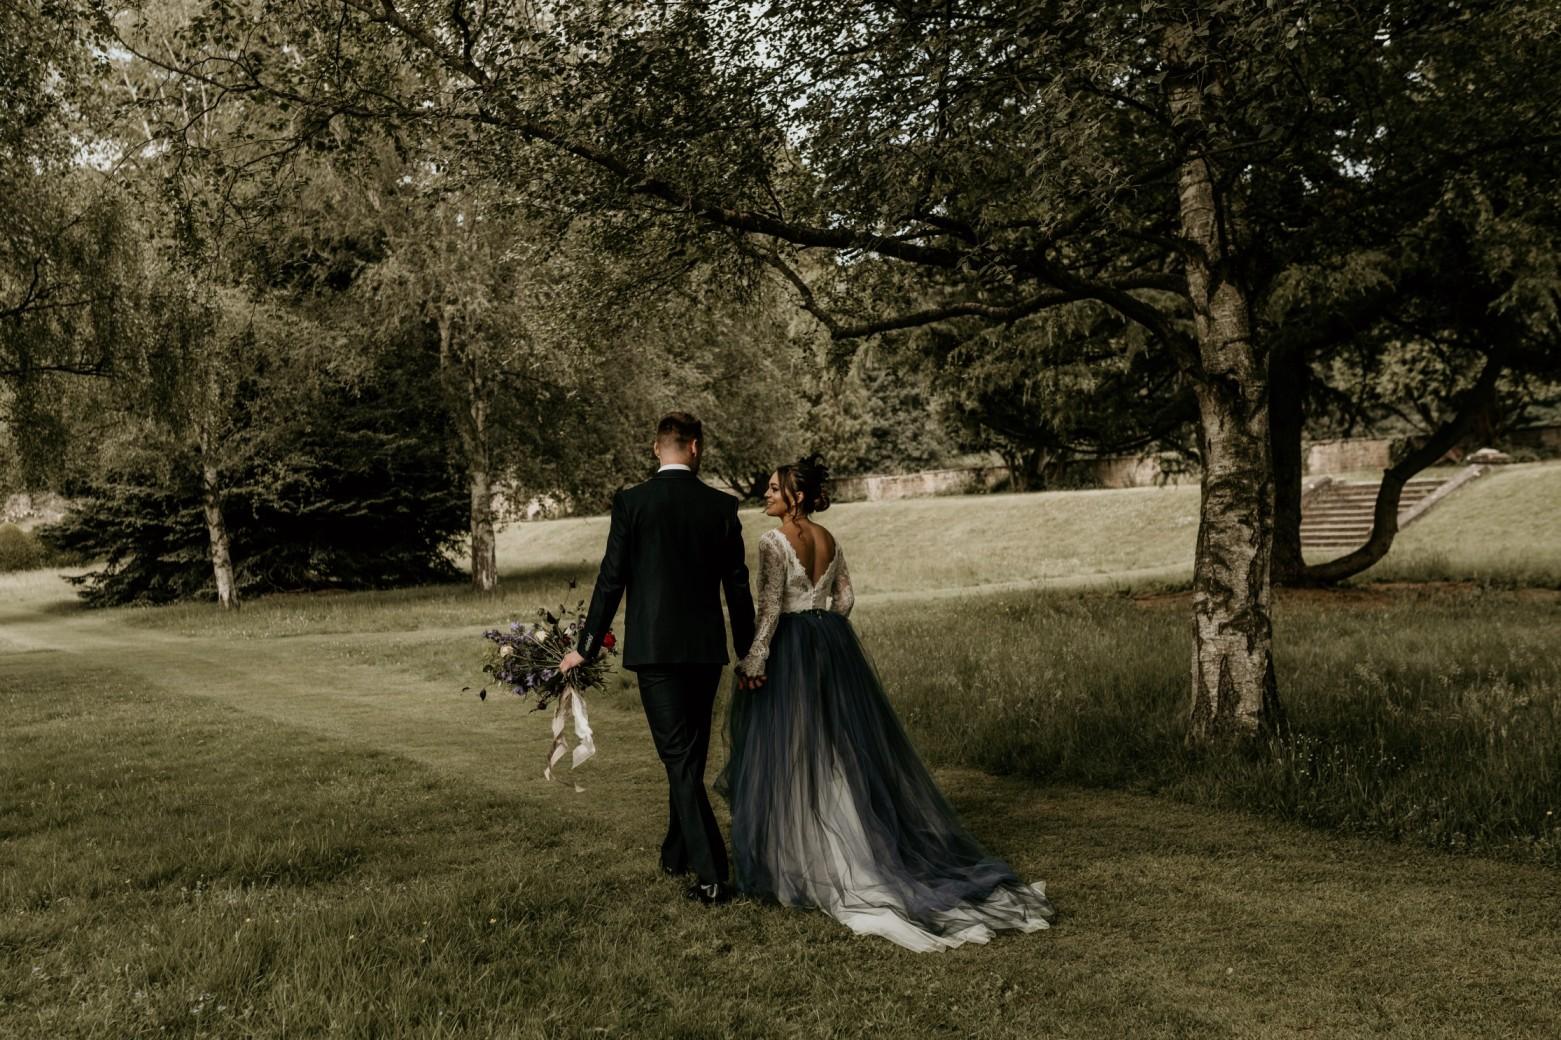 country garden wedding at newstead abbey - coloured wedding dress - alternative wedding dress - unconventional wedding